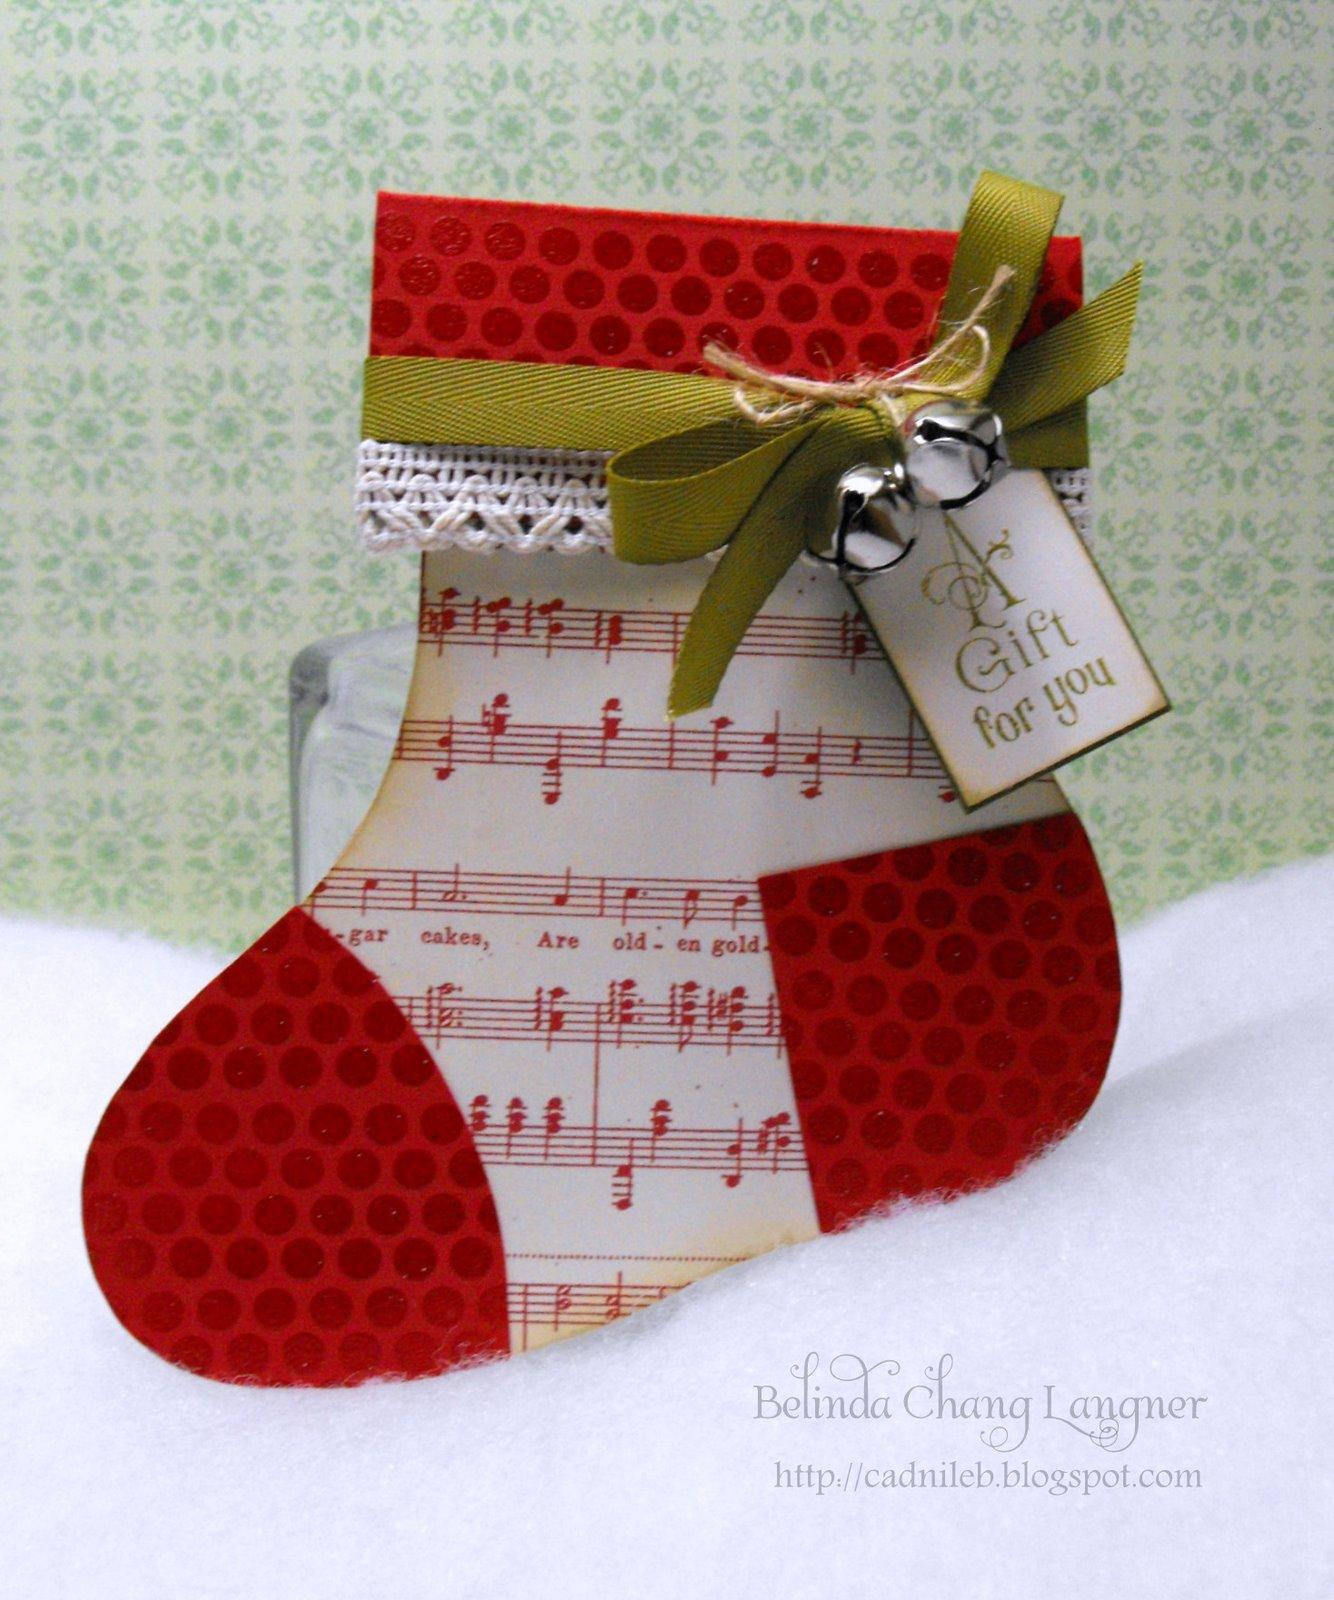 Gift Card Holder Template Gift card holder template